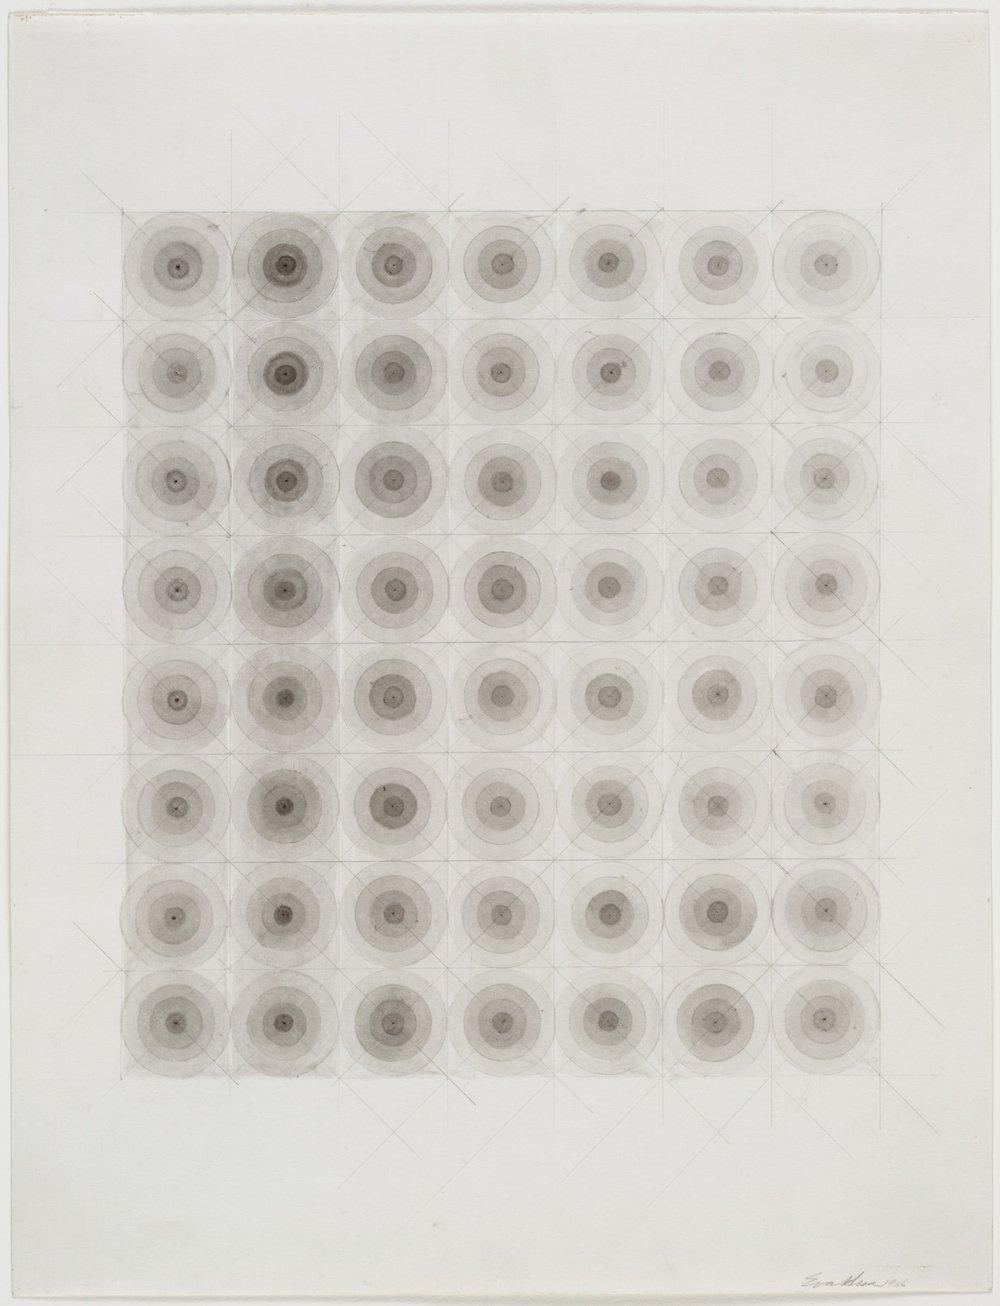 Eva Hesse, No Title, 1966.jpg